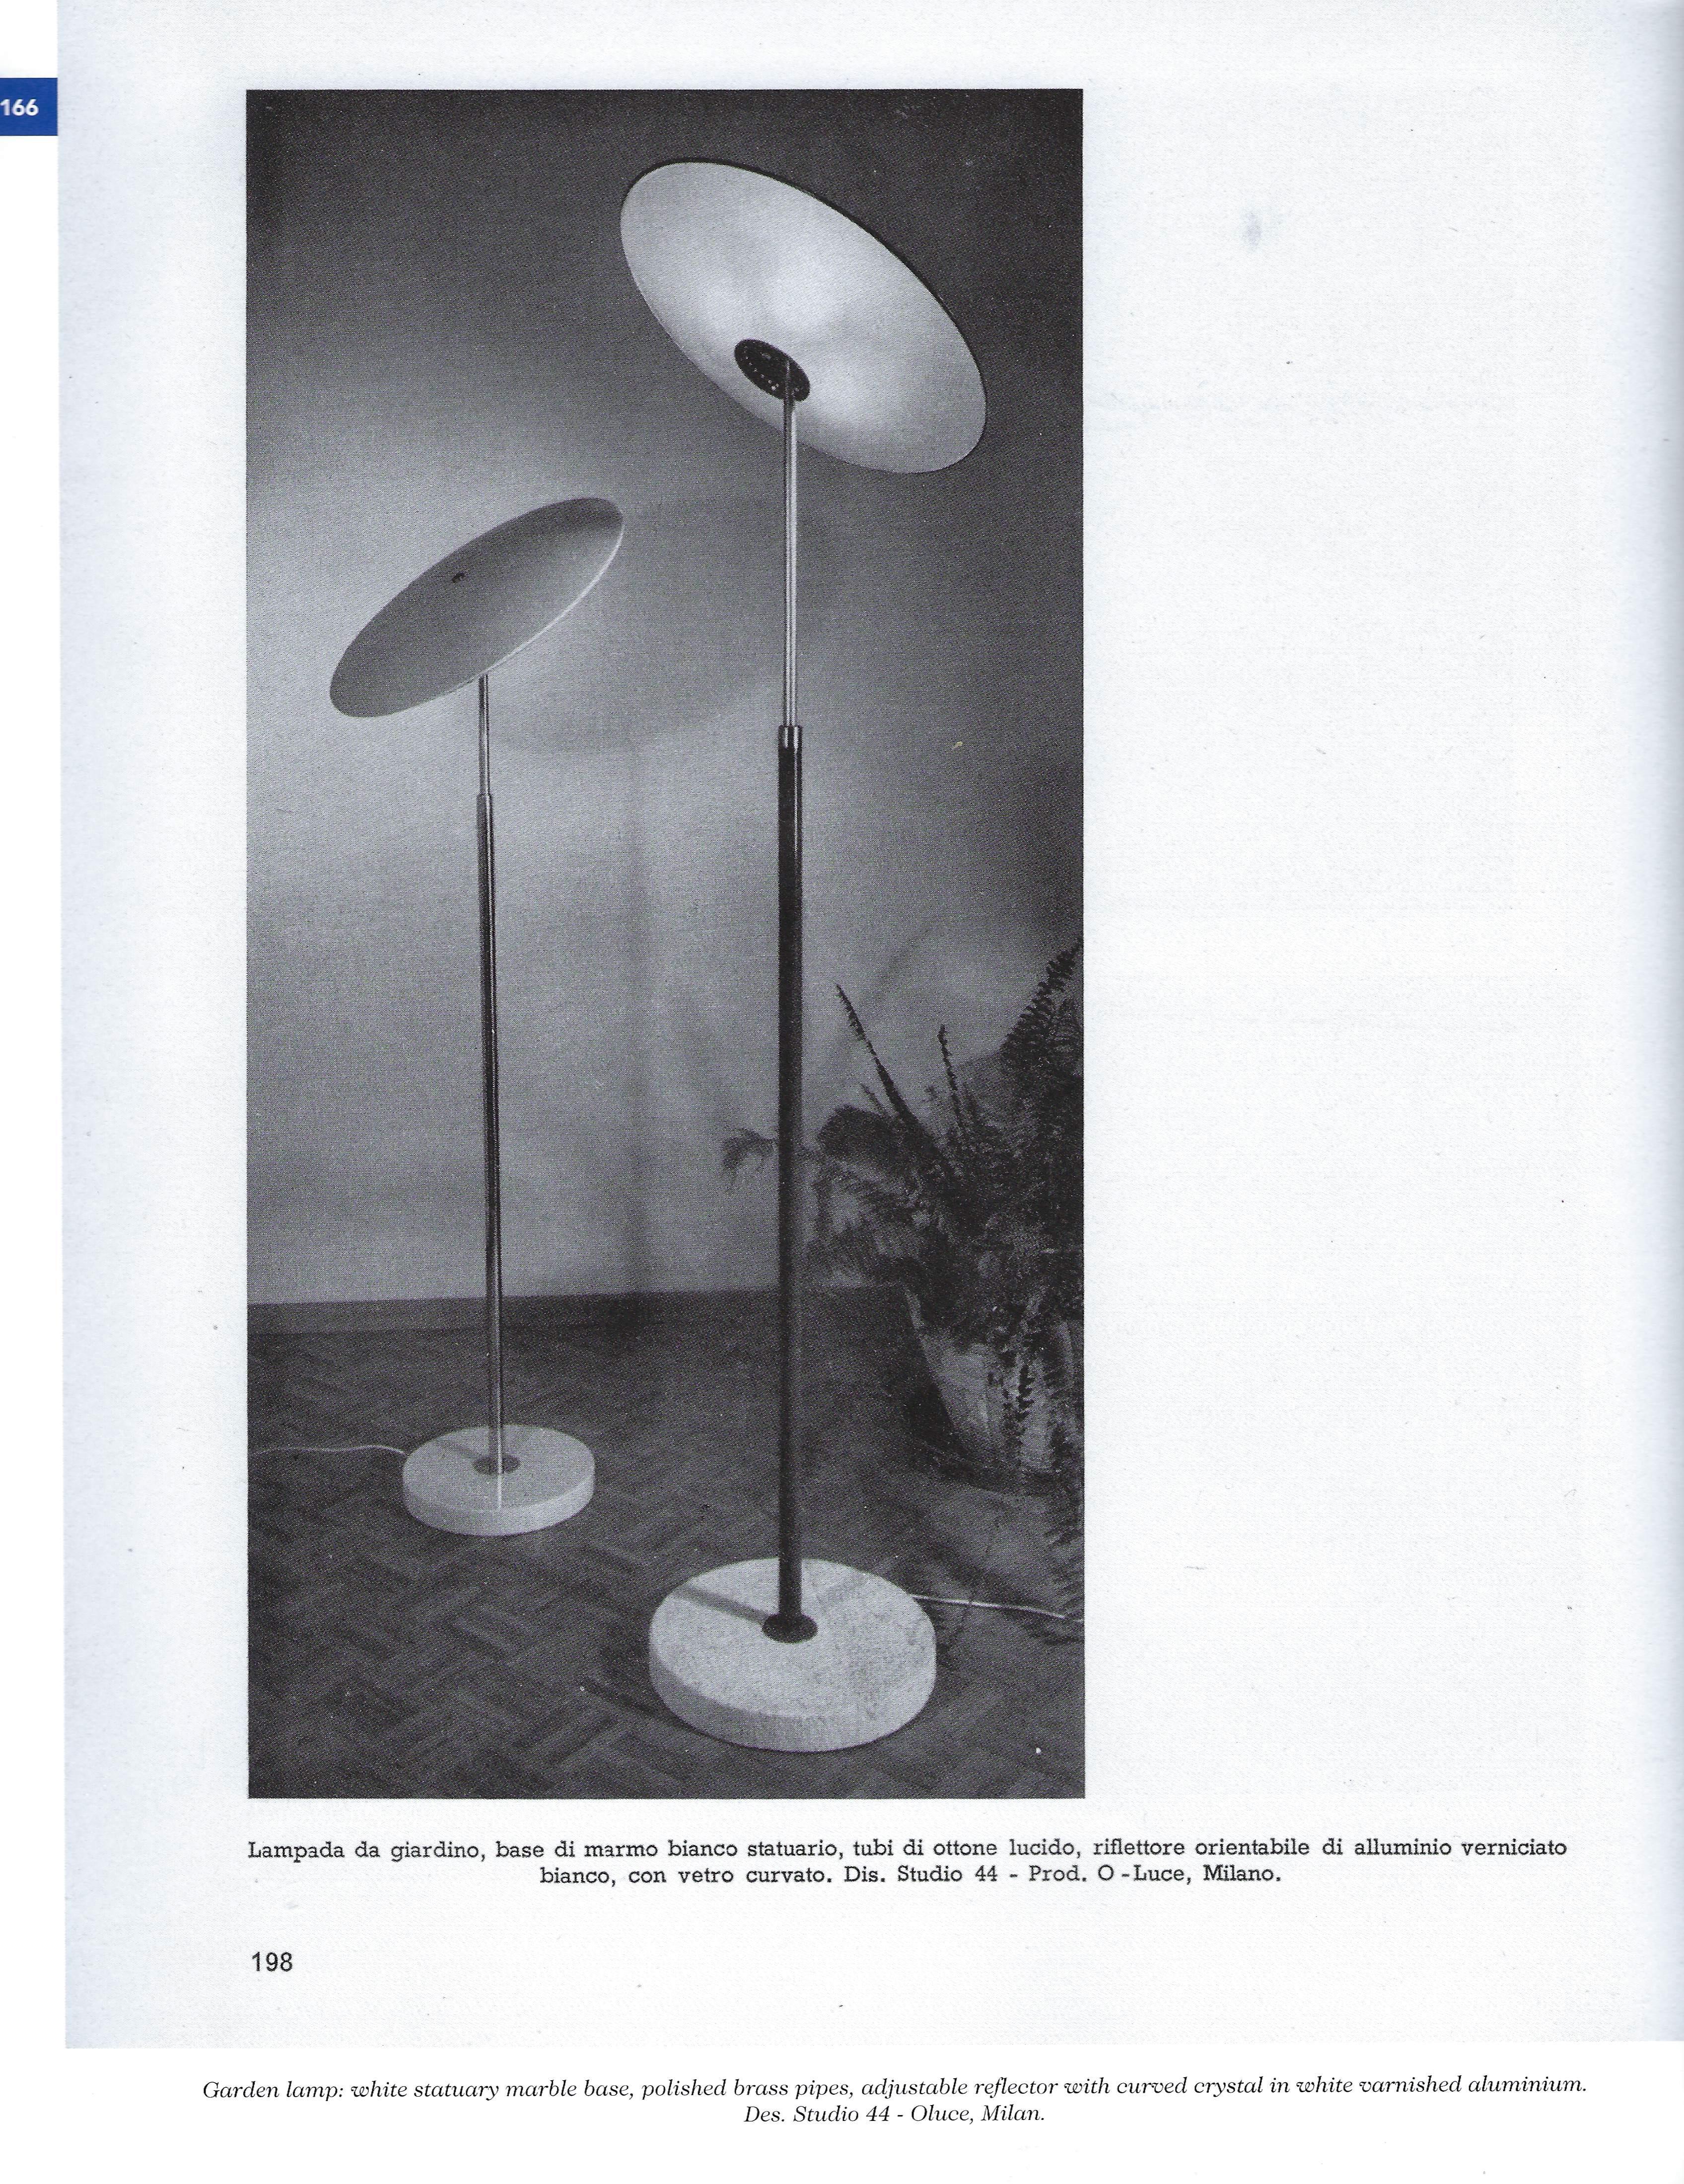 Lampada Da Studio Design oscar torlasco for o-luce rare table lamp for sale at 1stdibs